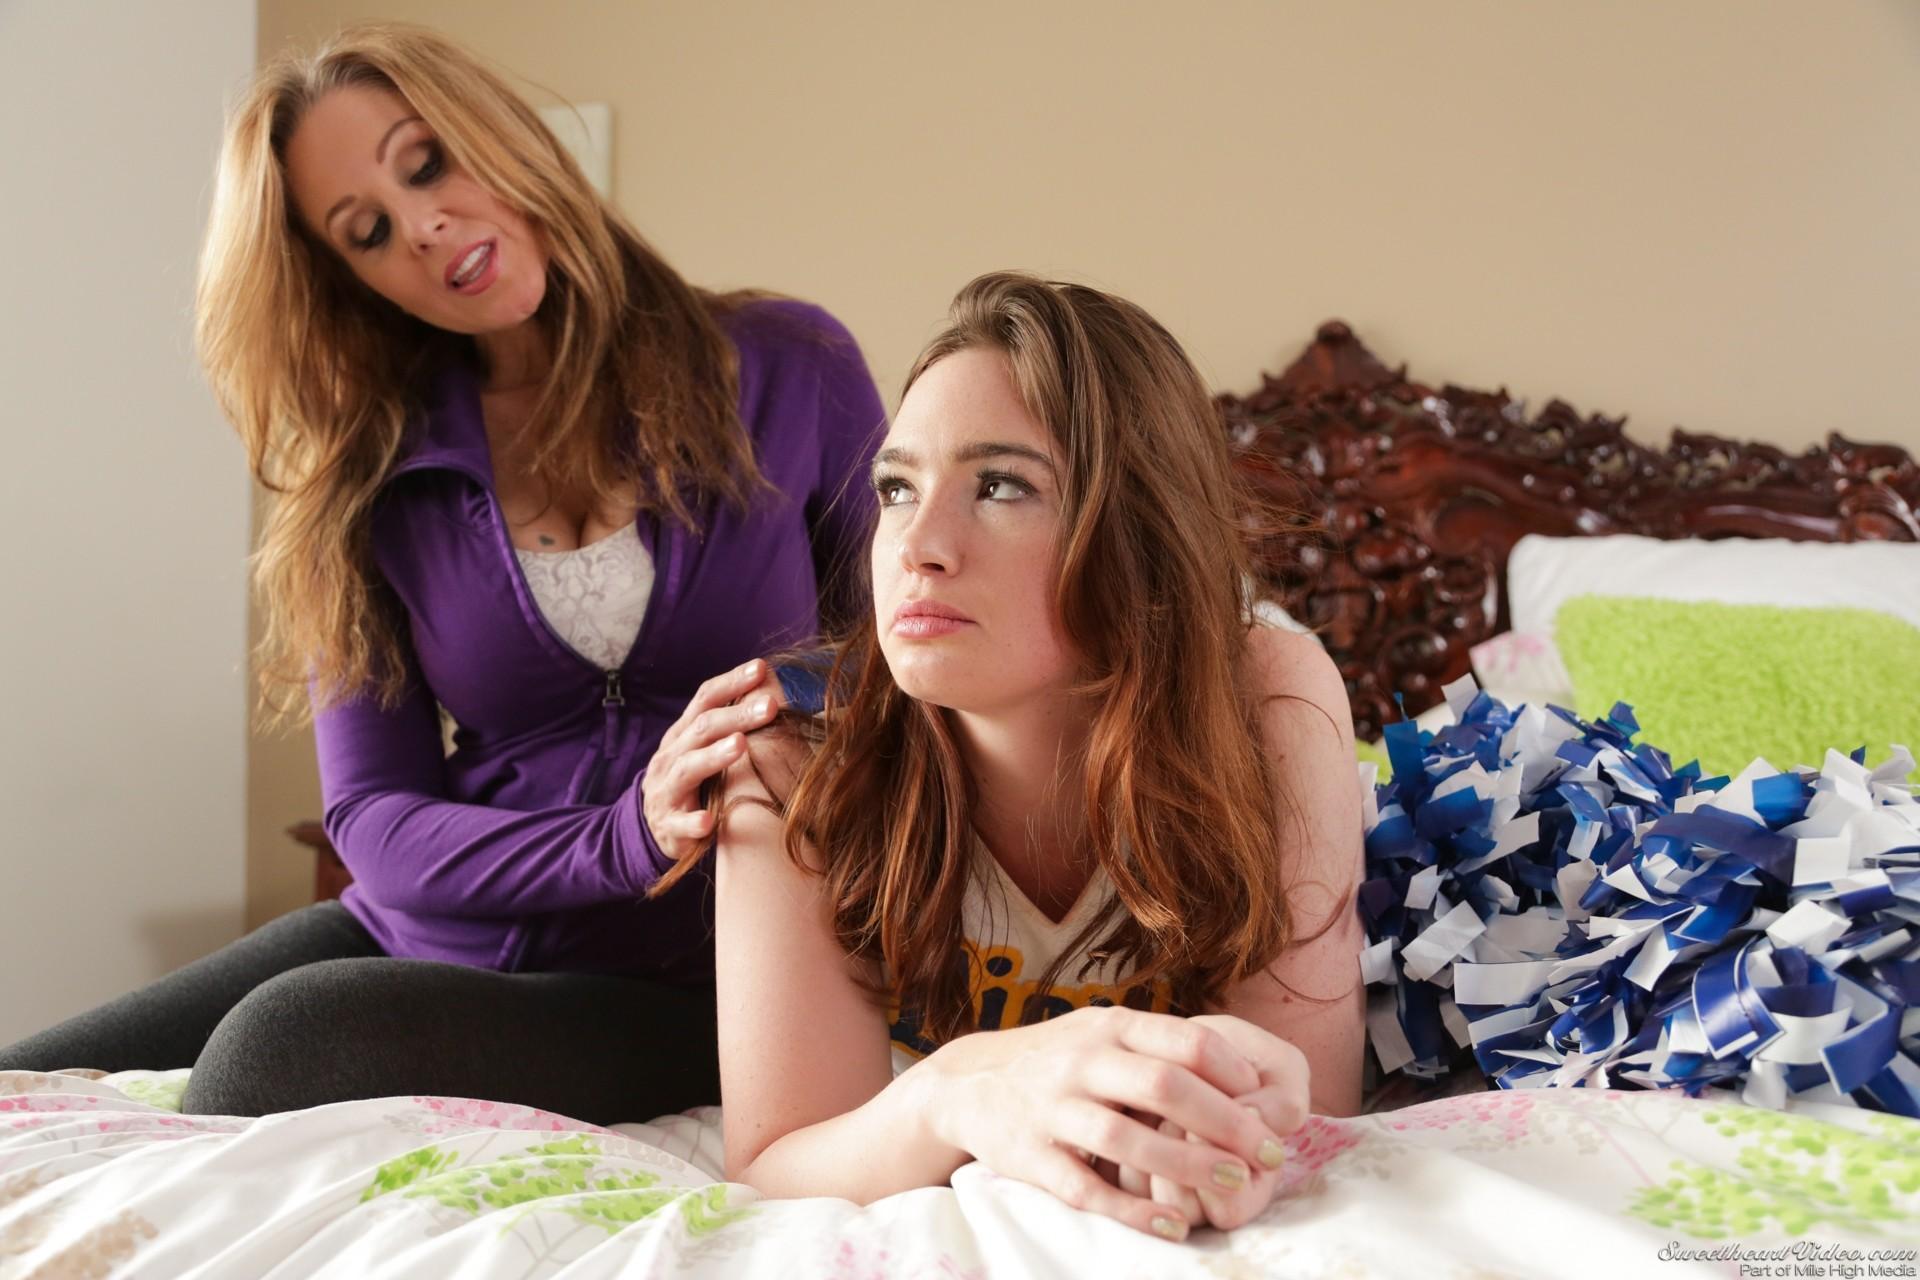 Carrie Ann and her teen gf Jodi Taylor in a threesome groupsex № 789943 загрузить